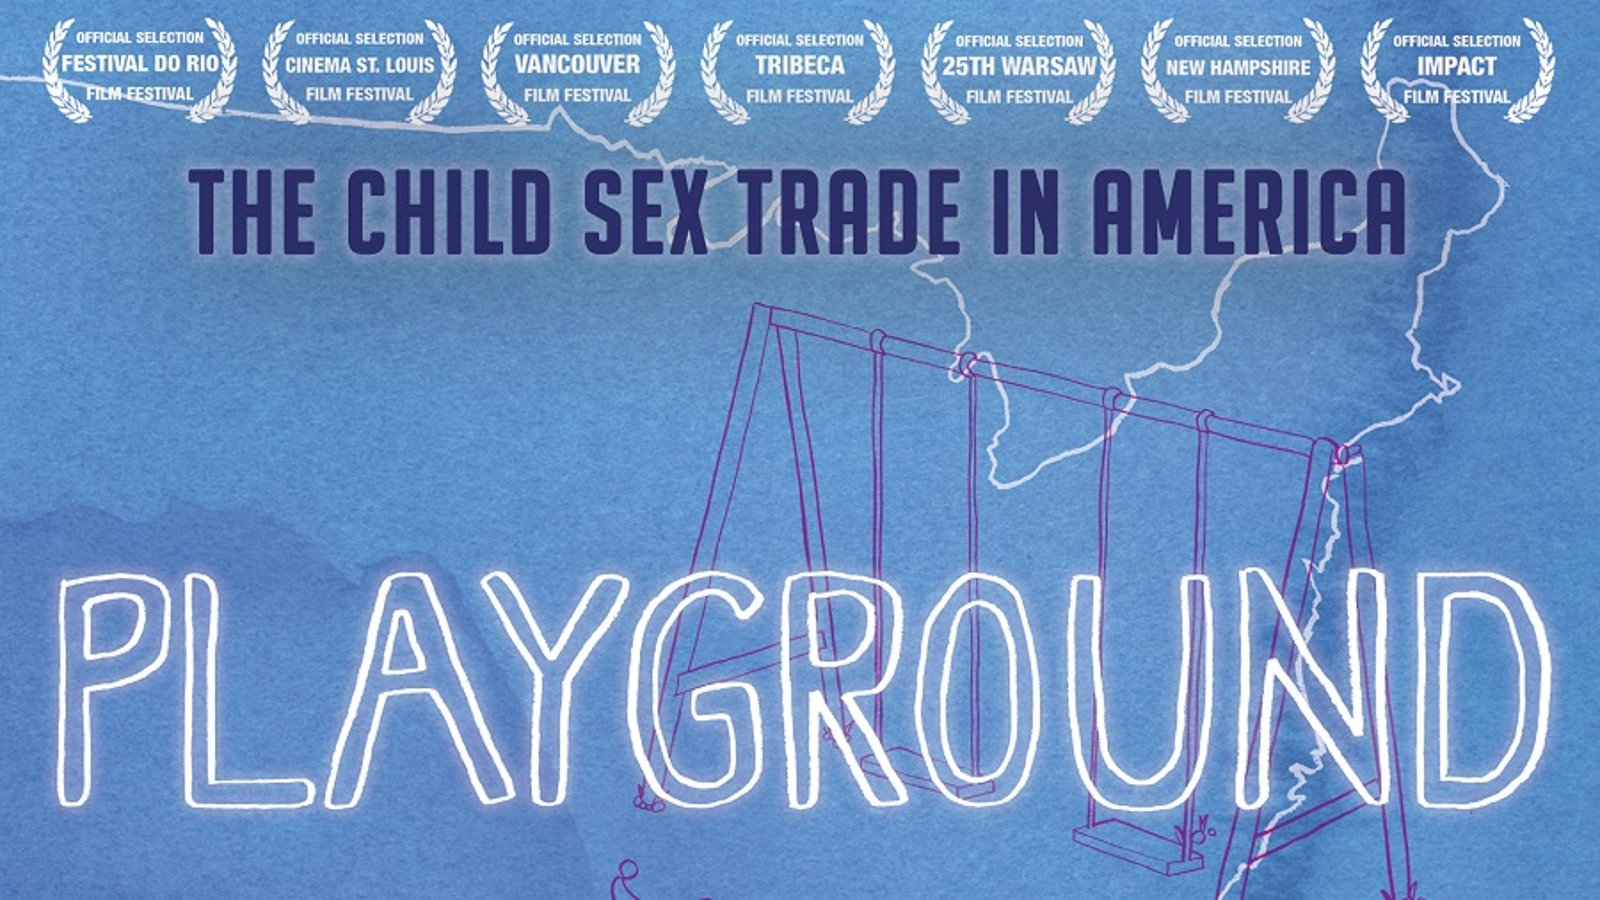 Playground - An Investigation into the Multi-Million Dollar Pedophilia Industry